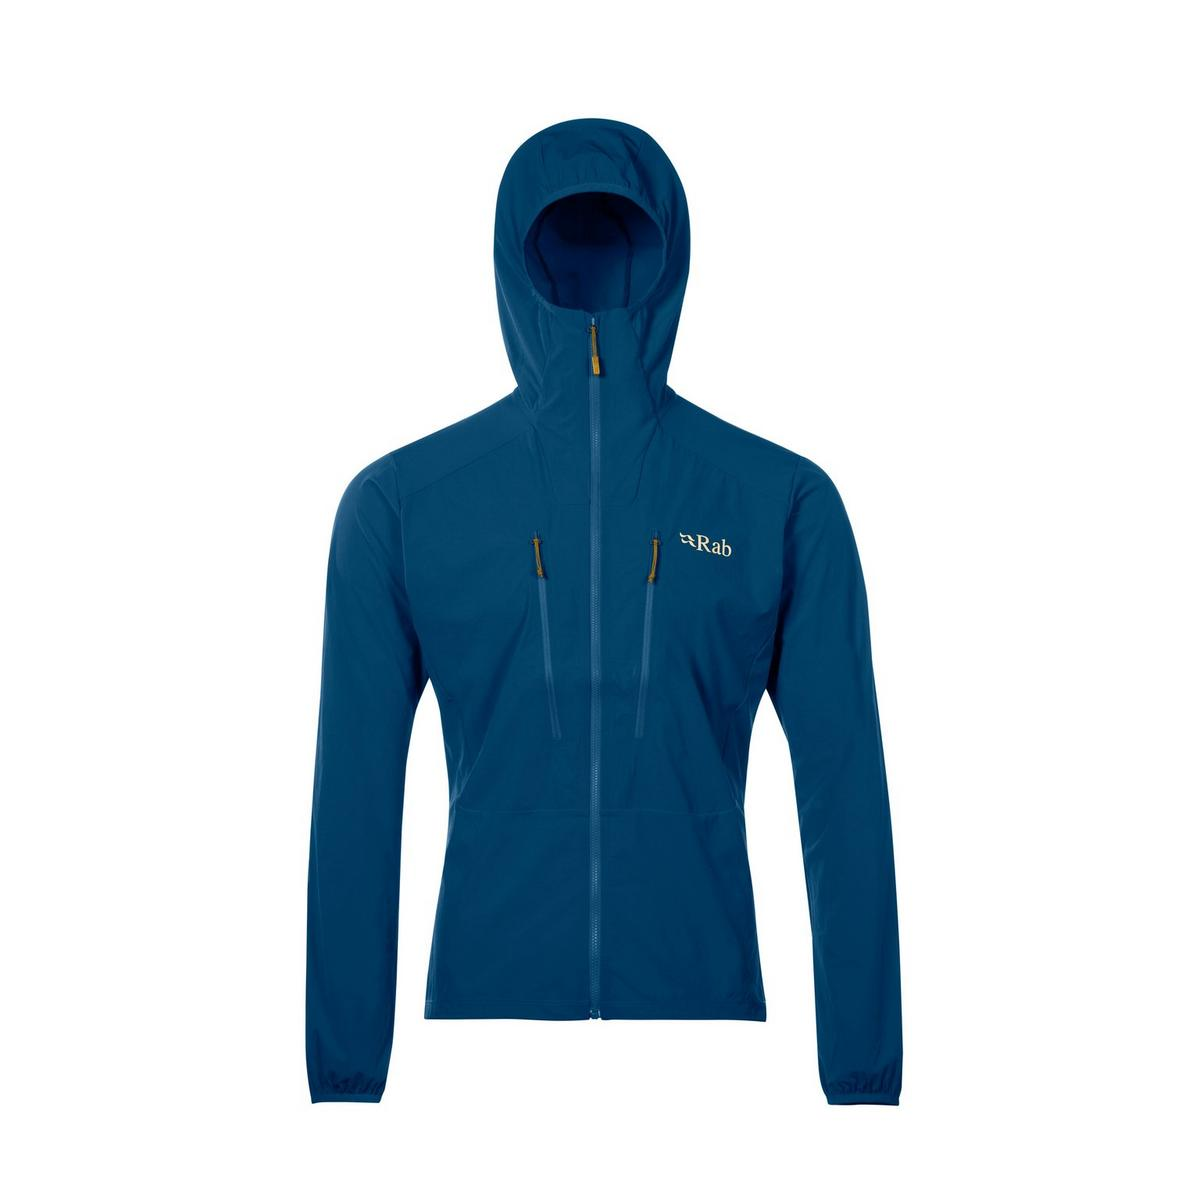 Rab Men's Borealis Jacket - Blue